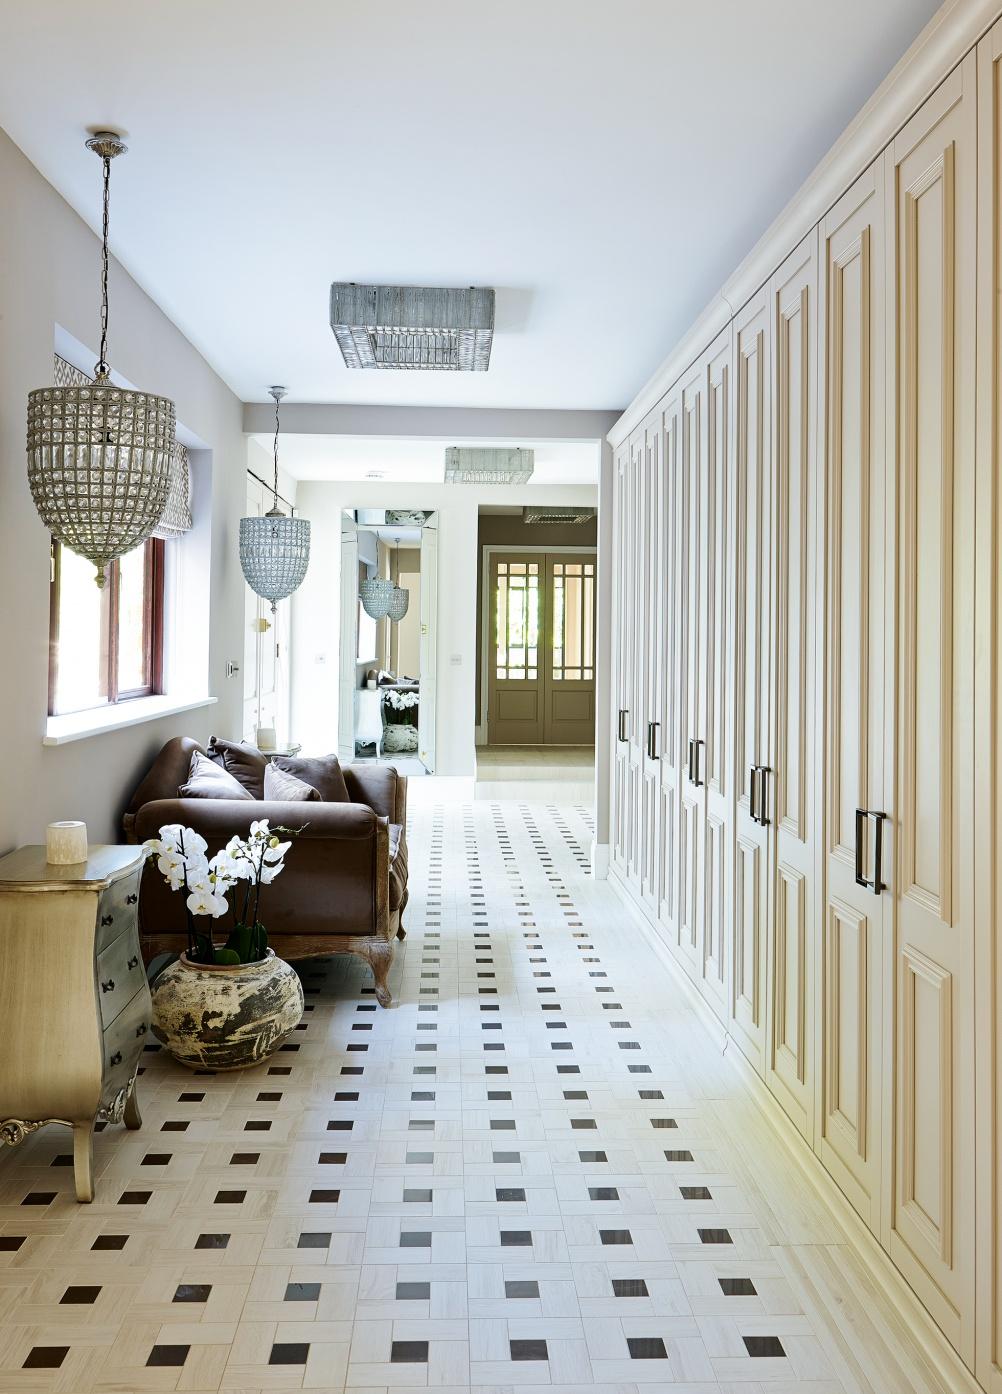 hallway-kier-townsend-1002x1394